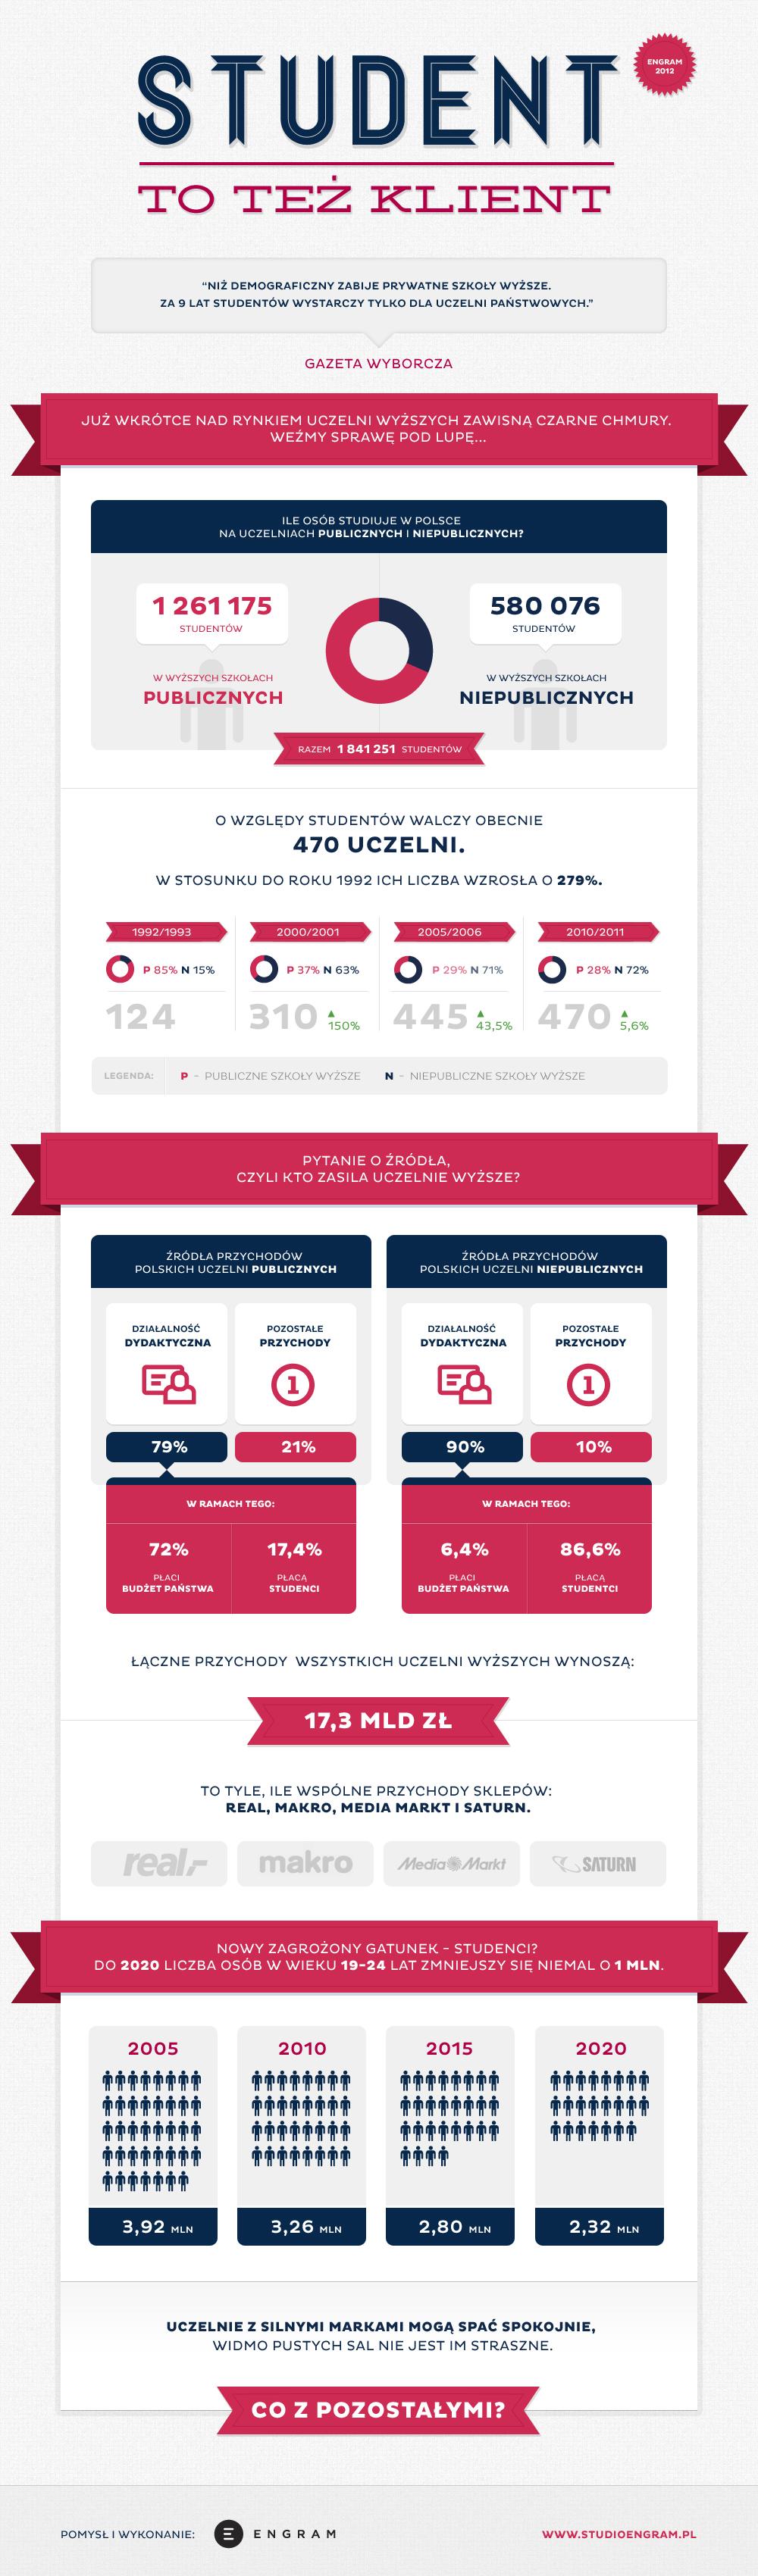 Student też klient. #Infographic #Student #StudentAsAConsumer